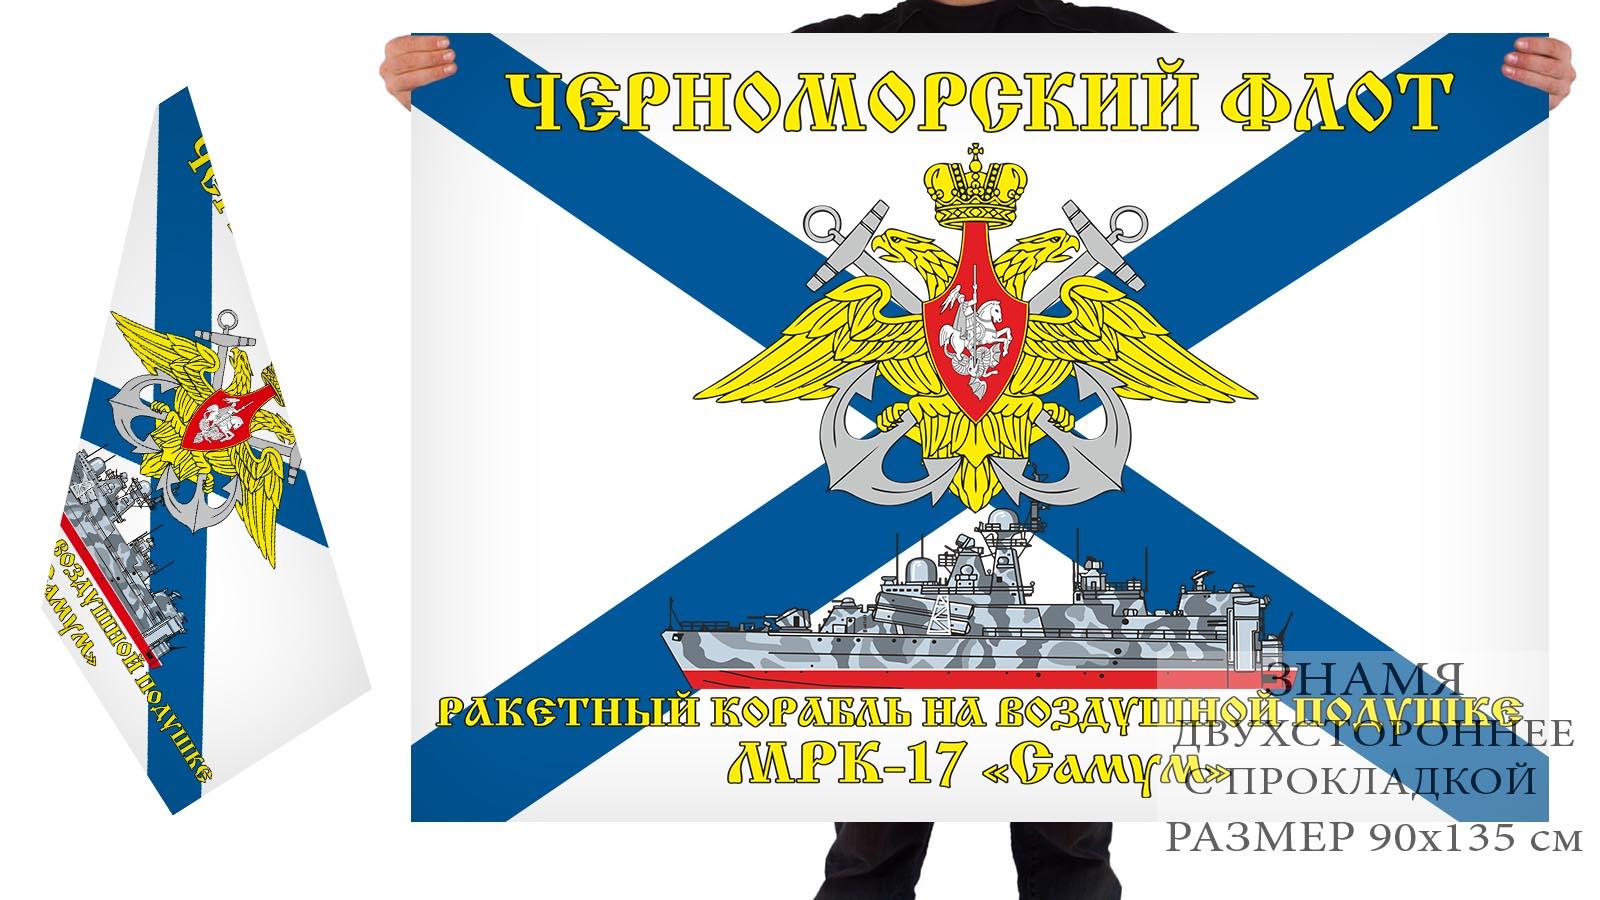 "Двусторонний флаг ракетного корабля на воздушной подушке МРК-17 ""Самум"""